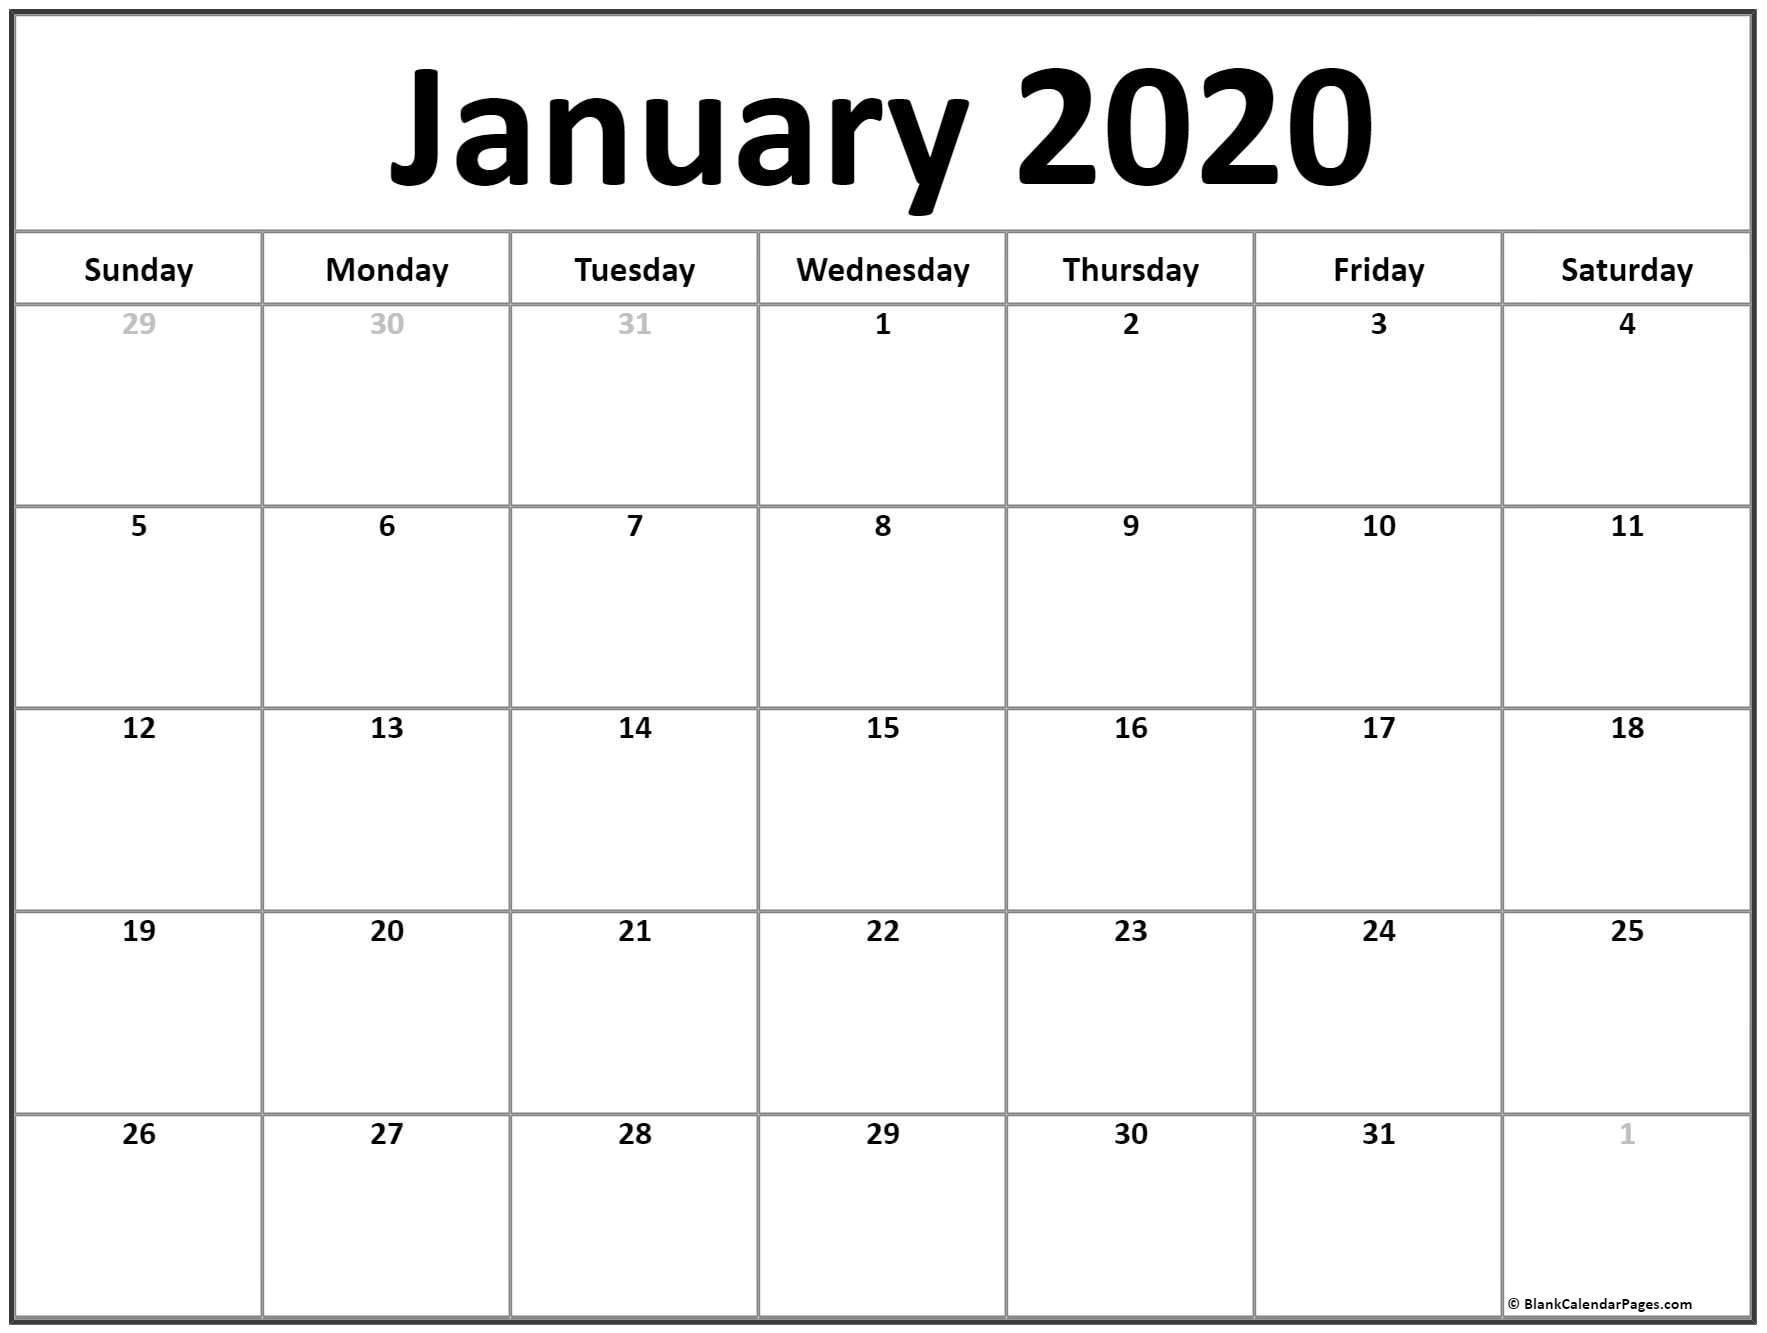 Print Google Calendar To Pdf